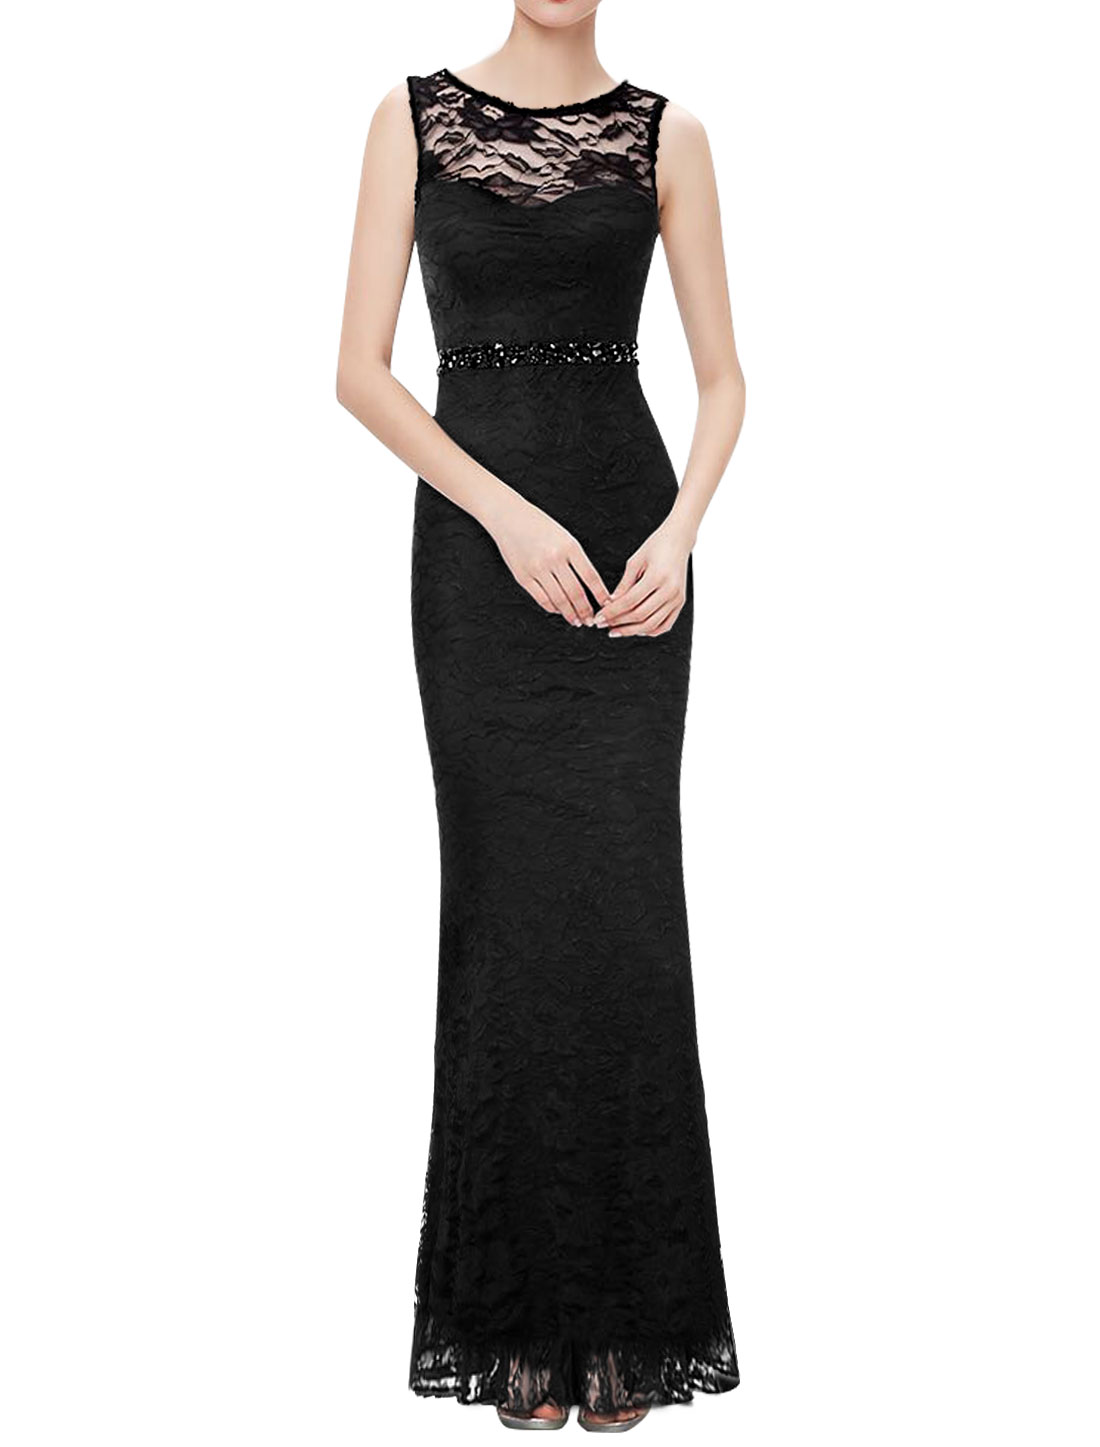 Women Sleeveless Rhinestones Semi Sheer Lace Maxi Dress Black XS